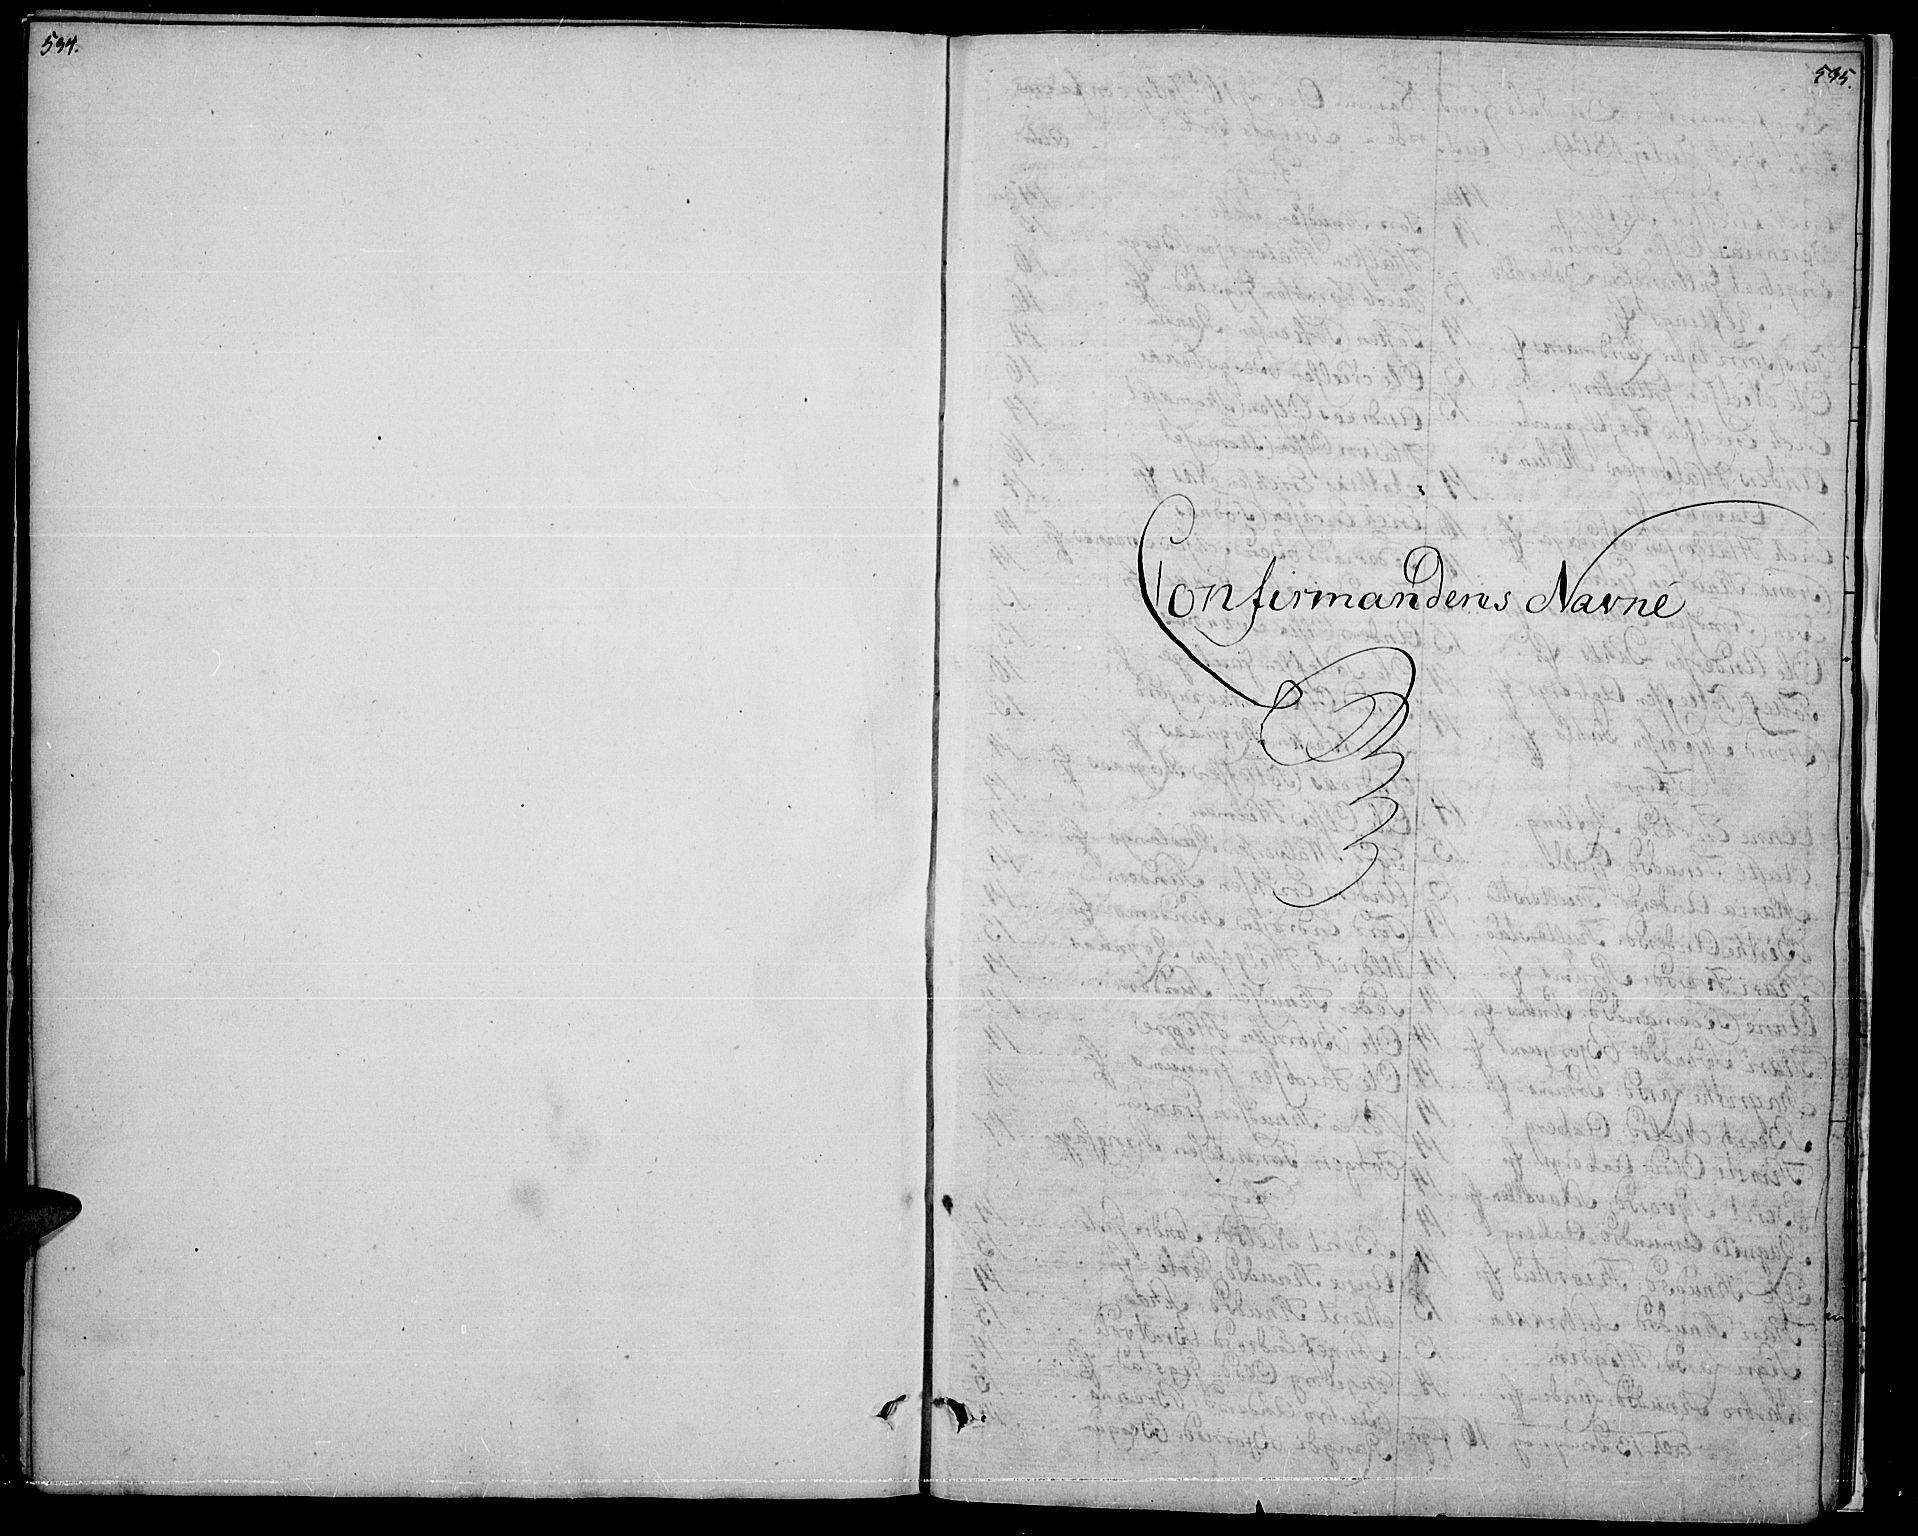 SAH, Nord-Aurdal prestekontor, Ministerialbok nr. 1, 1808-1815, s. 534-535